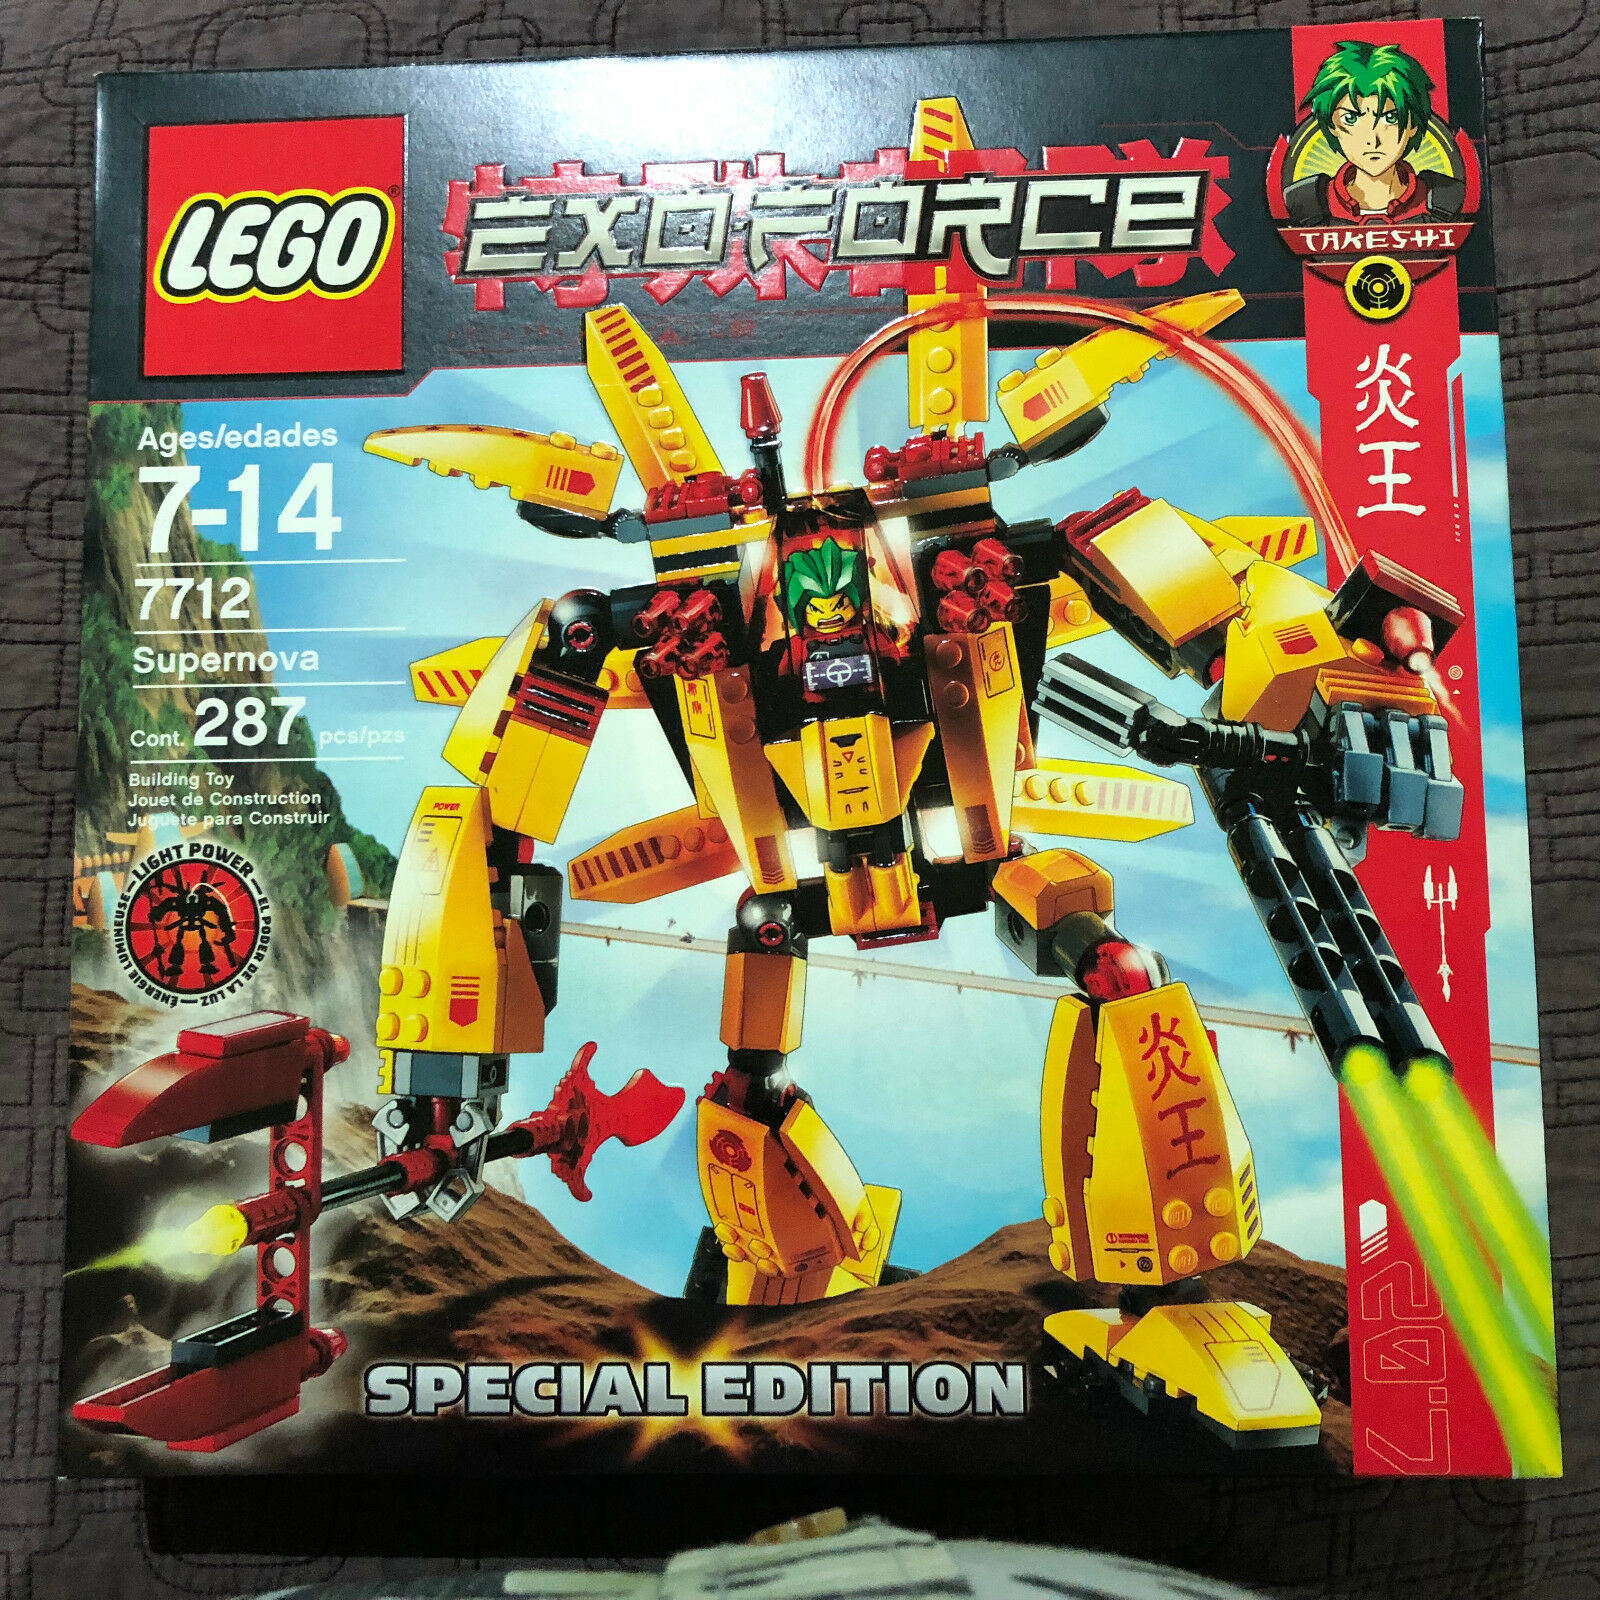 LEGO 7712 Exo-Force 7712 Supernova Limited Edition Light Power - Nuovo Mint SEALED